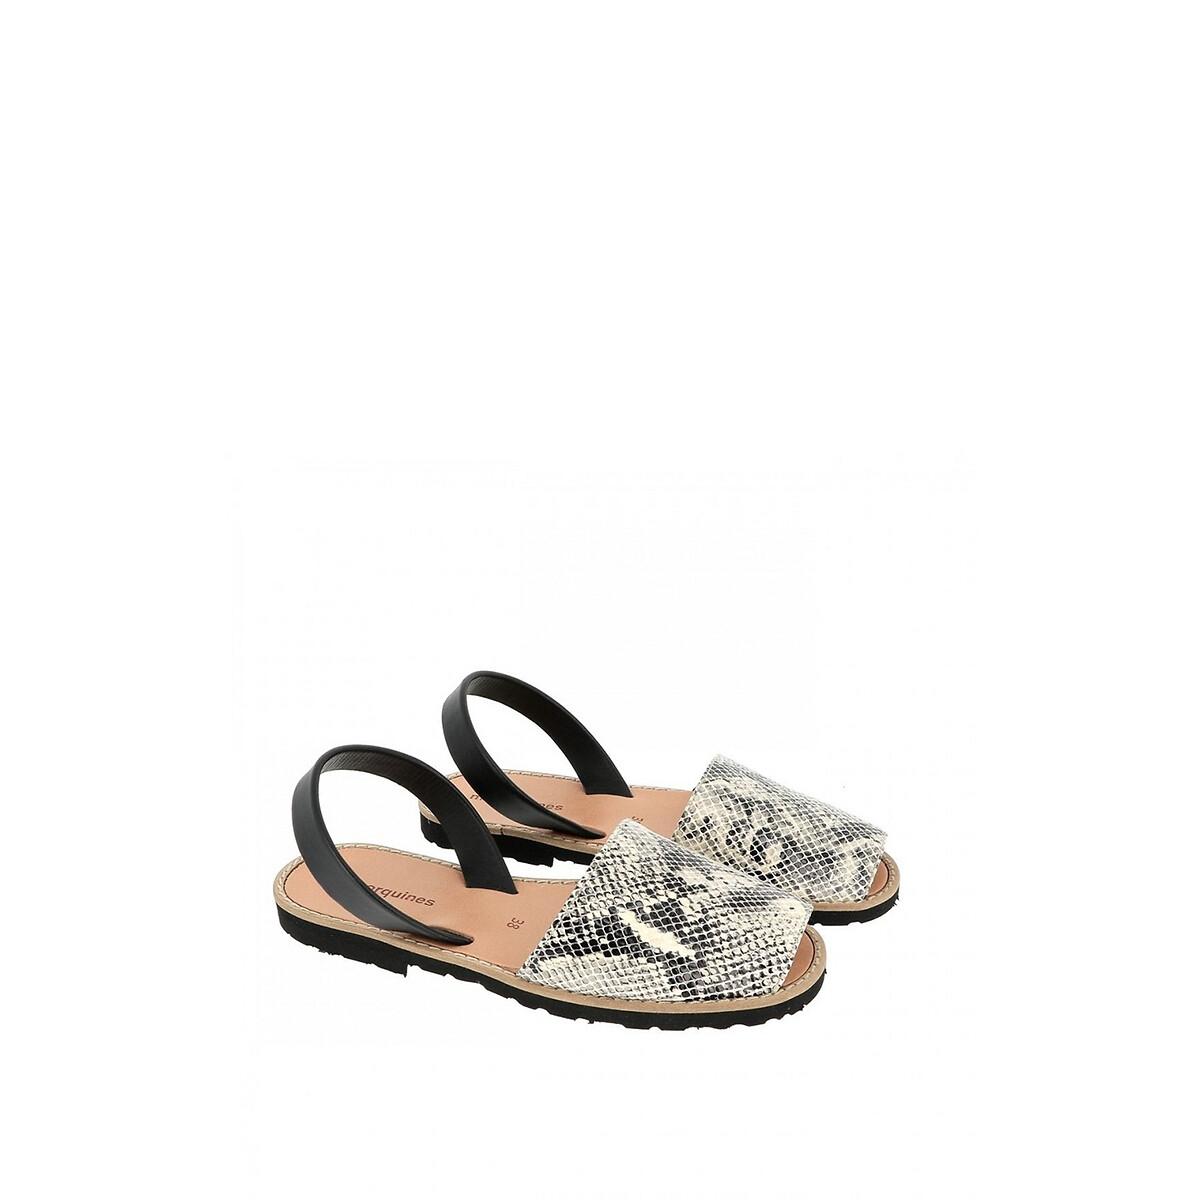 цена Сандалии La Redoute Кожаные на плоском каблуке AVARCA REPTILE 36 серый онлайн в 2017 году